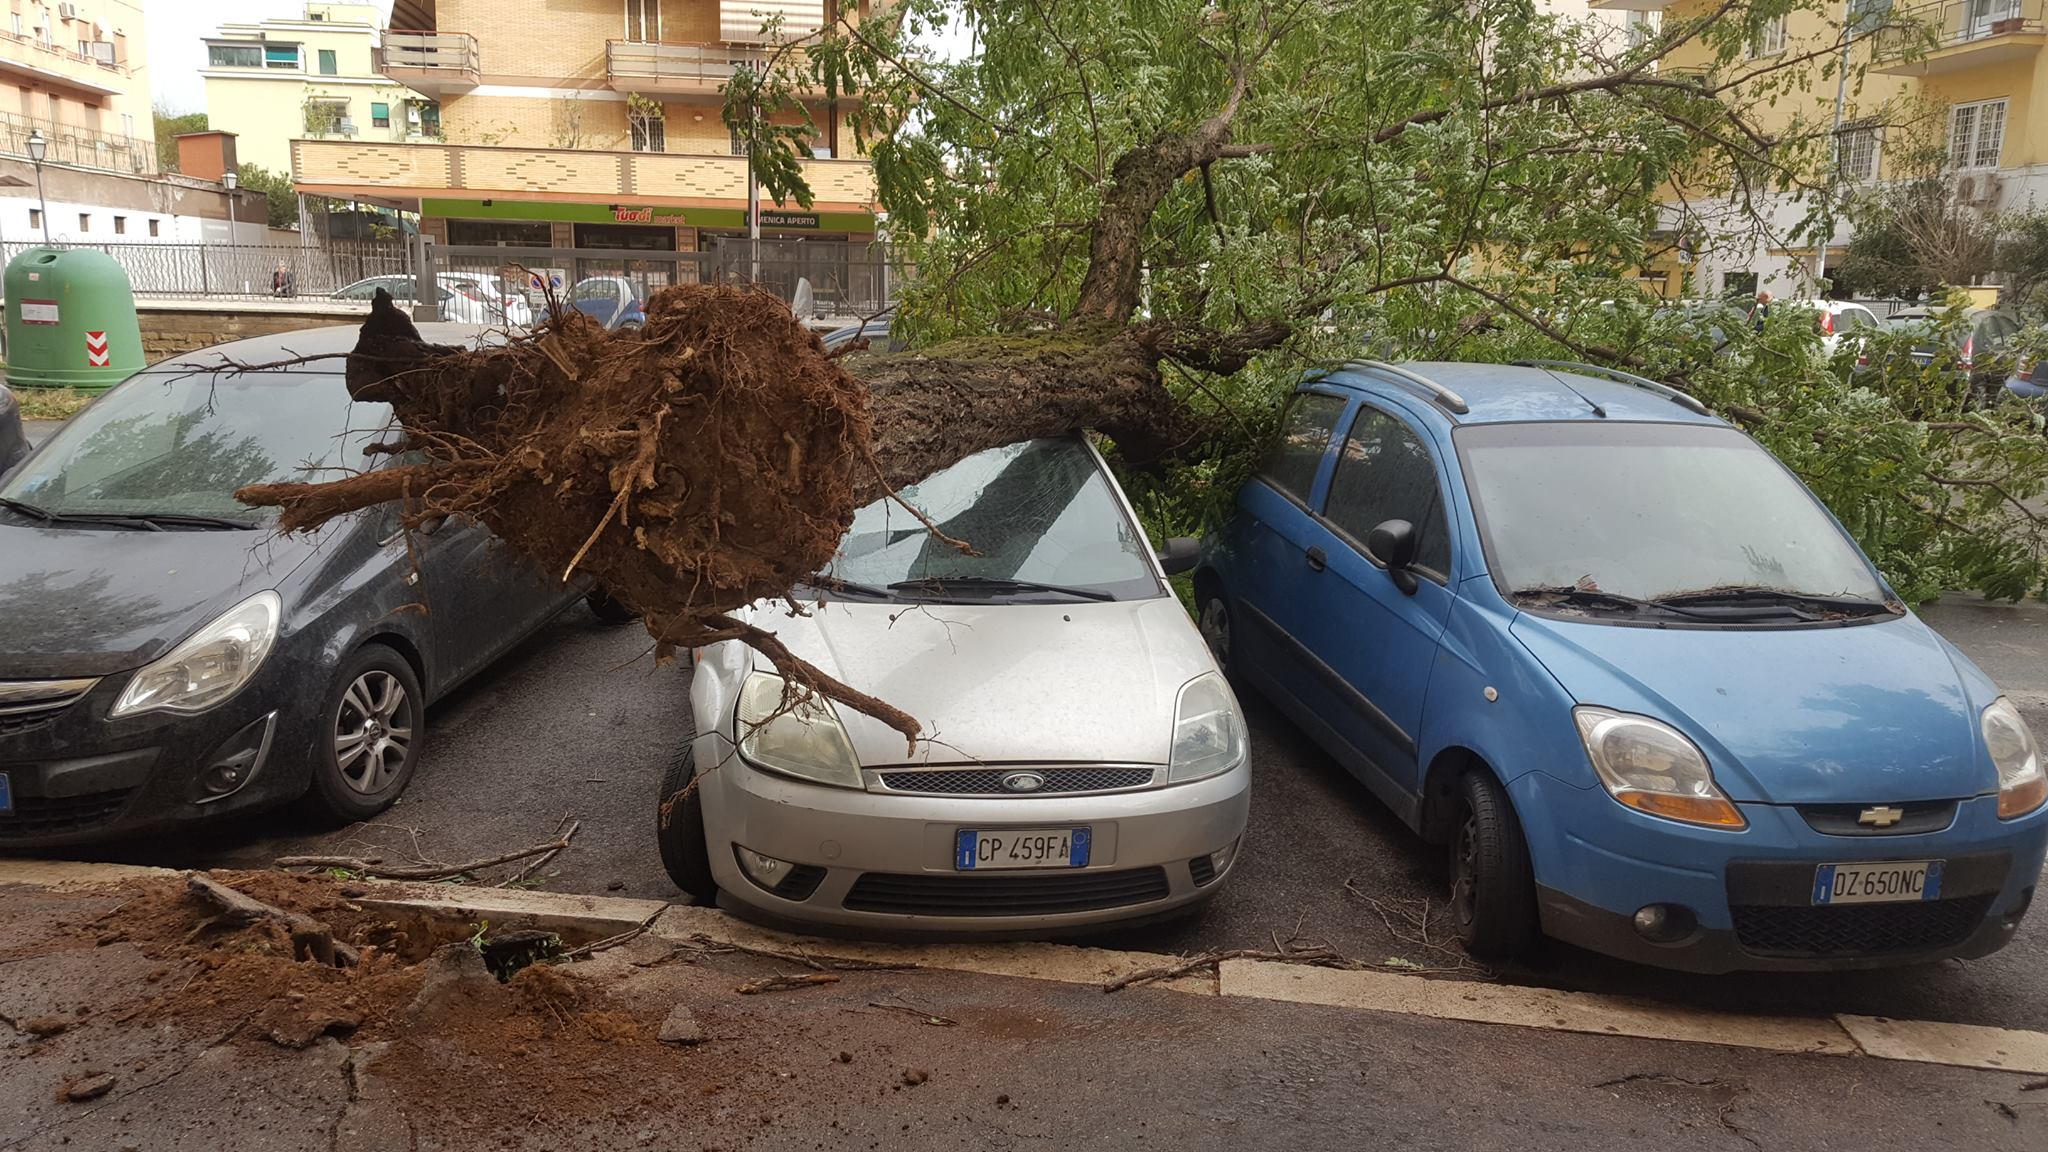 via Rocca Priora